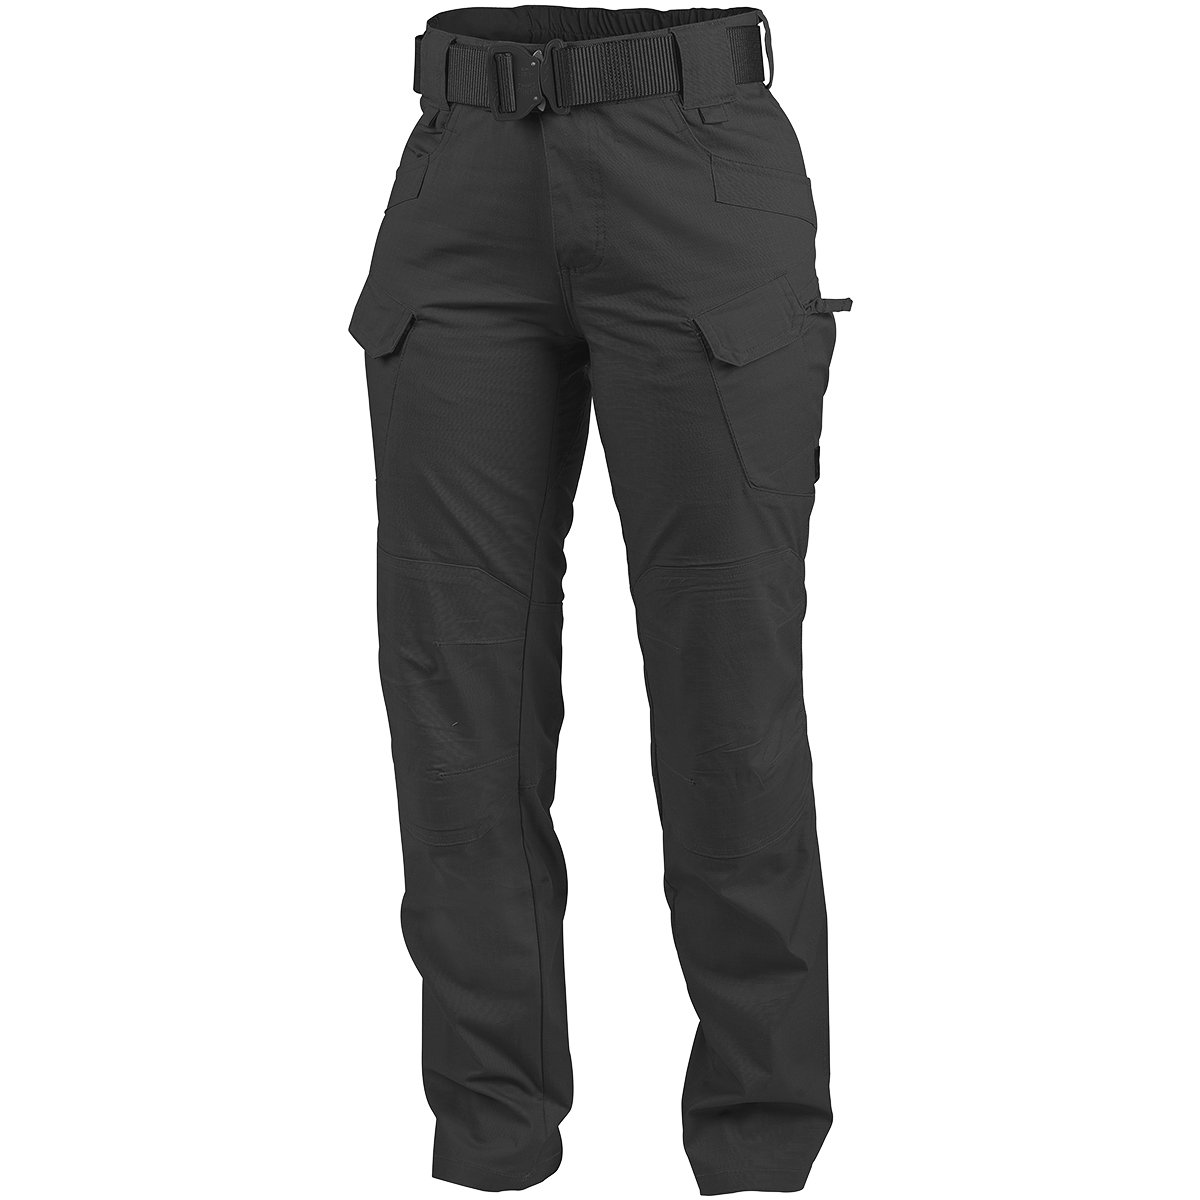 Helikon Women's UTP Trousers Black Polycotton Ripstop HELIKON-TEX